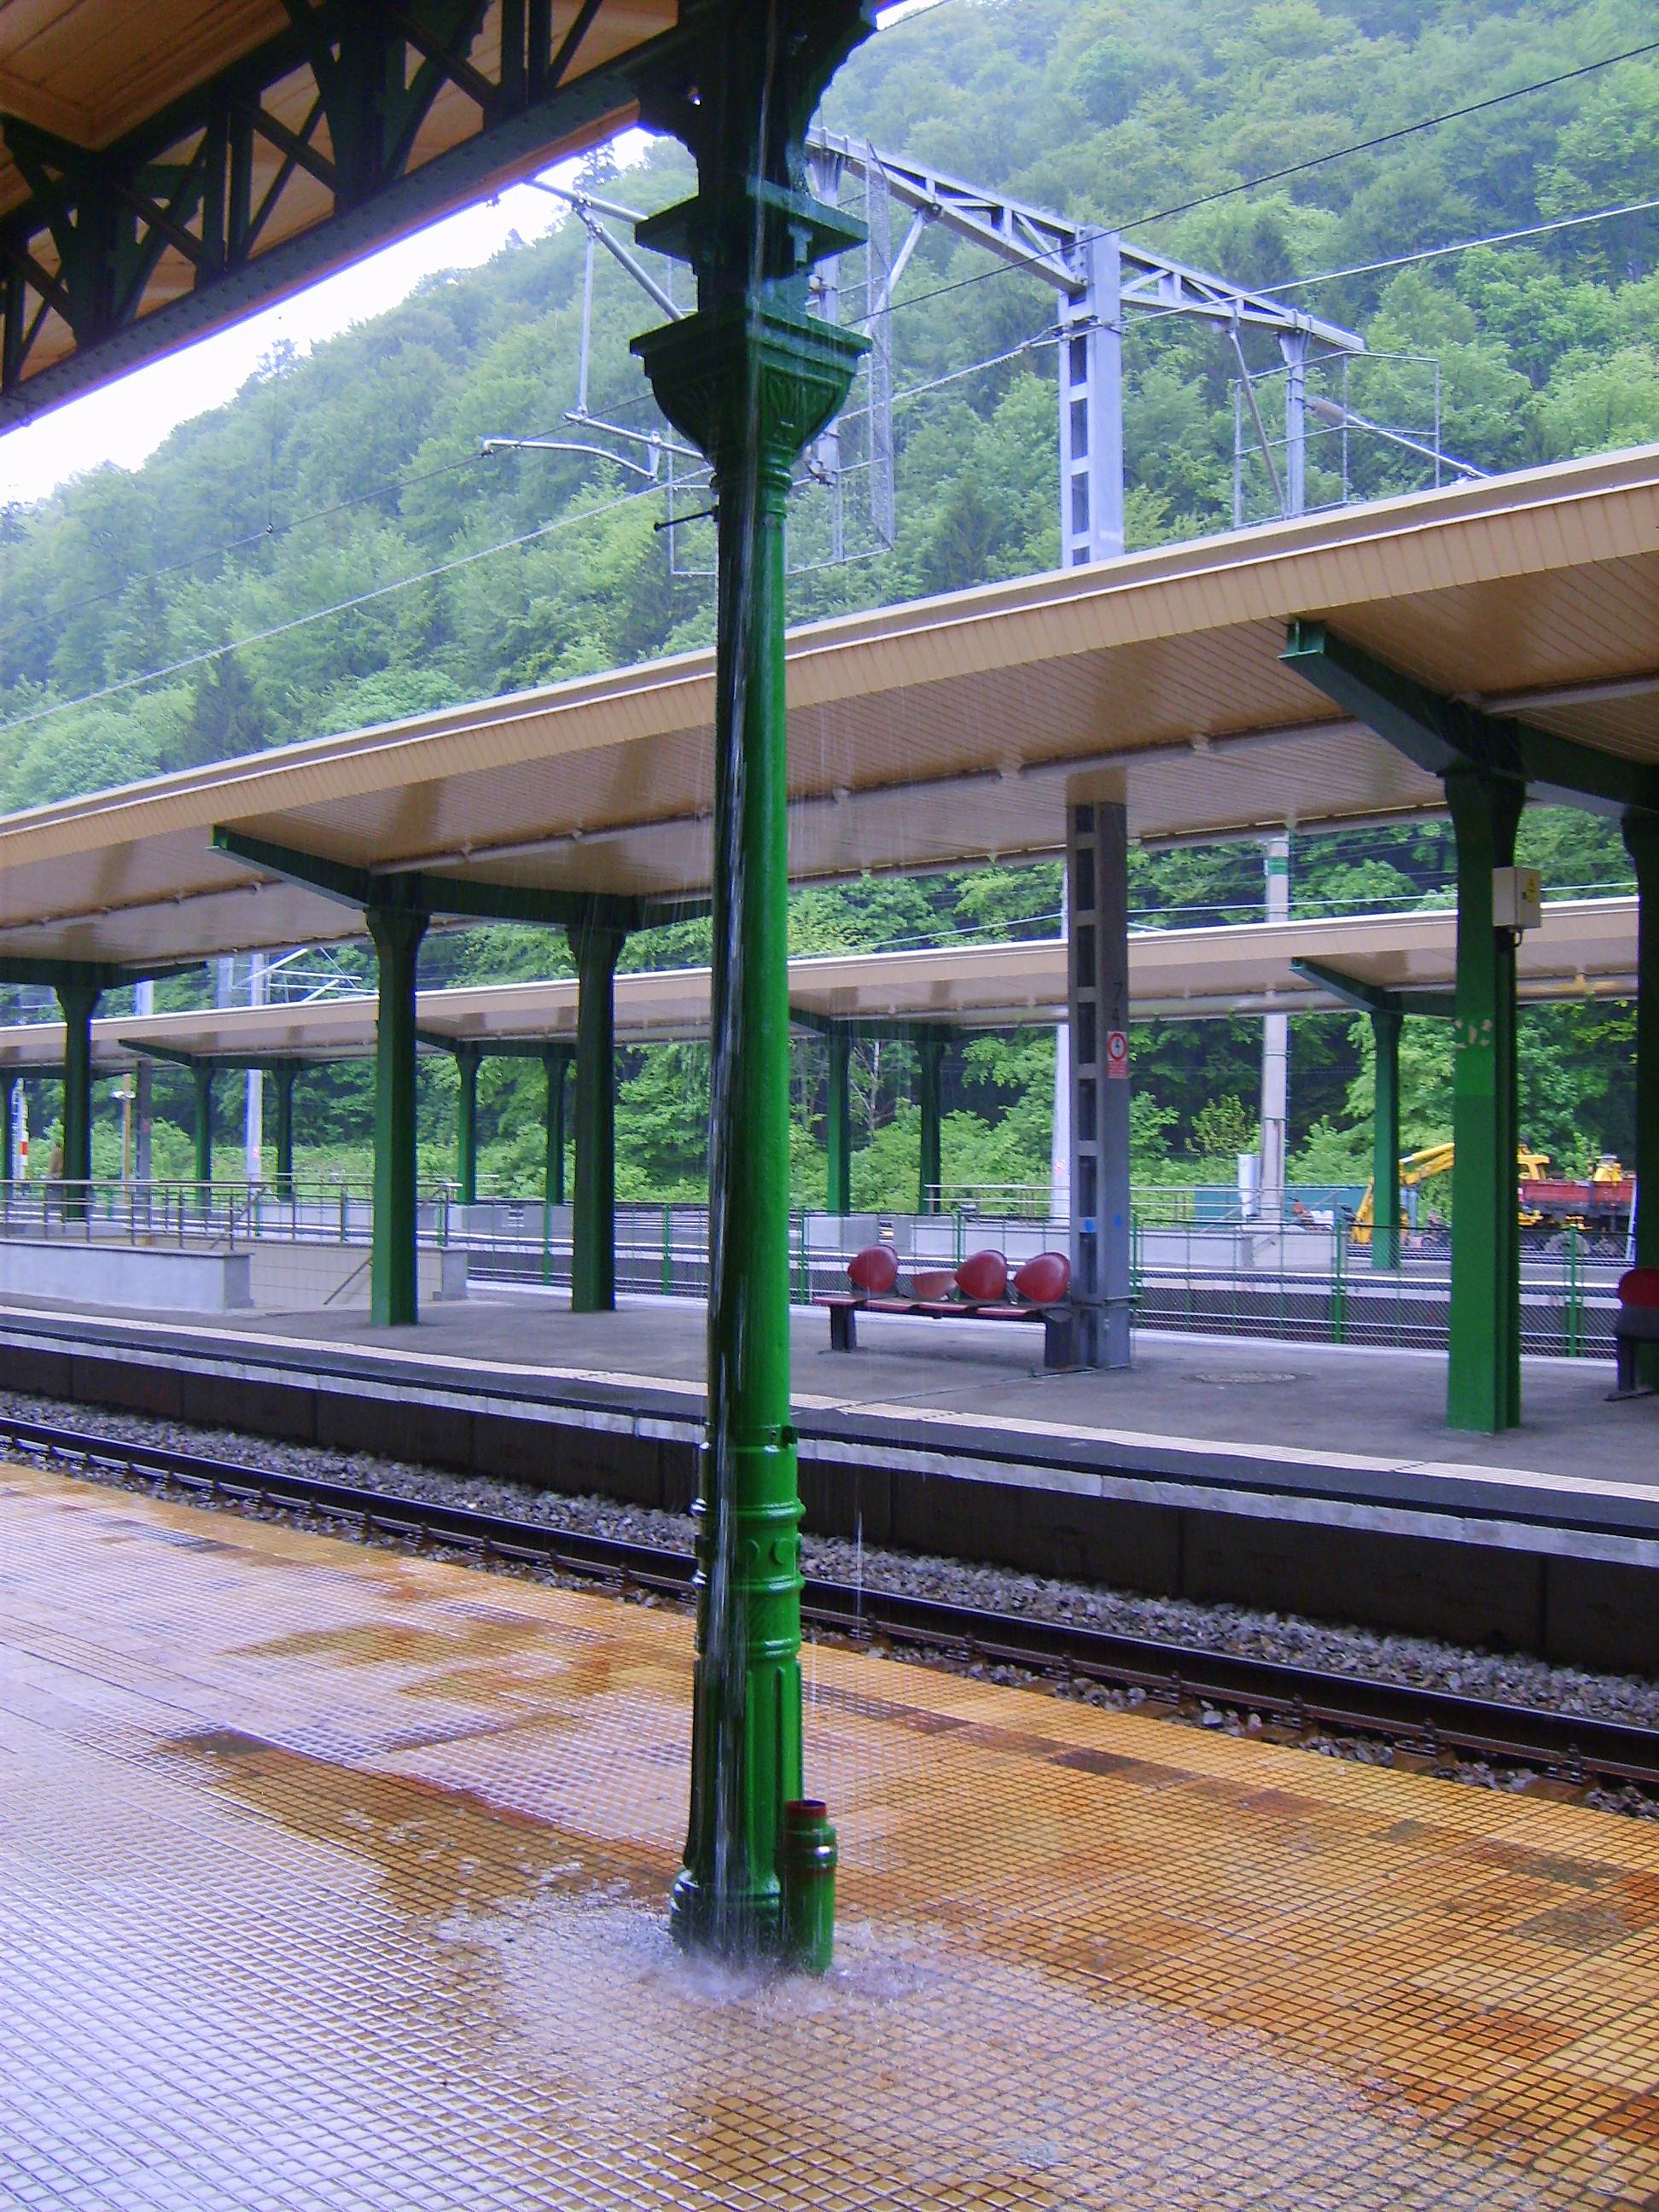 Dworzec w Sinai w deszczu - Rumunia